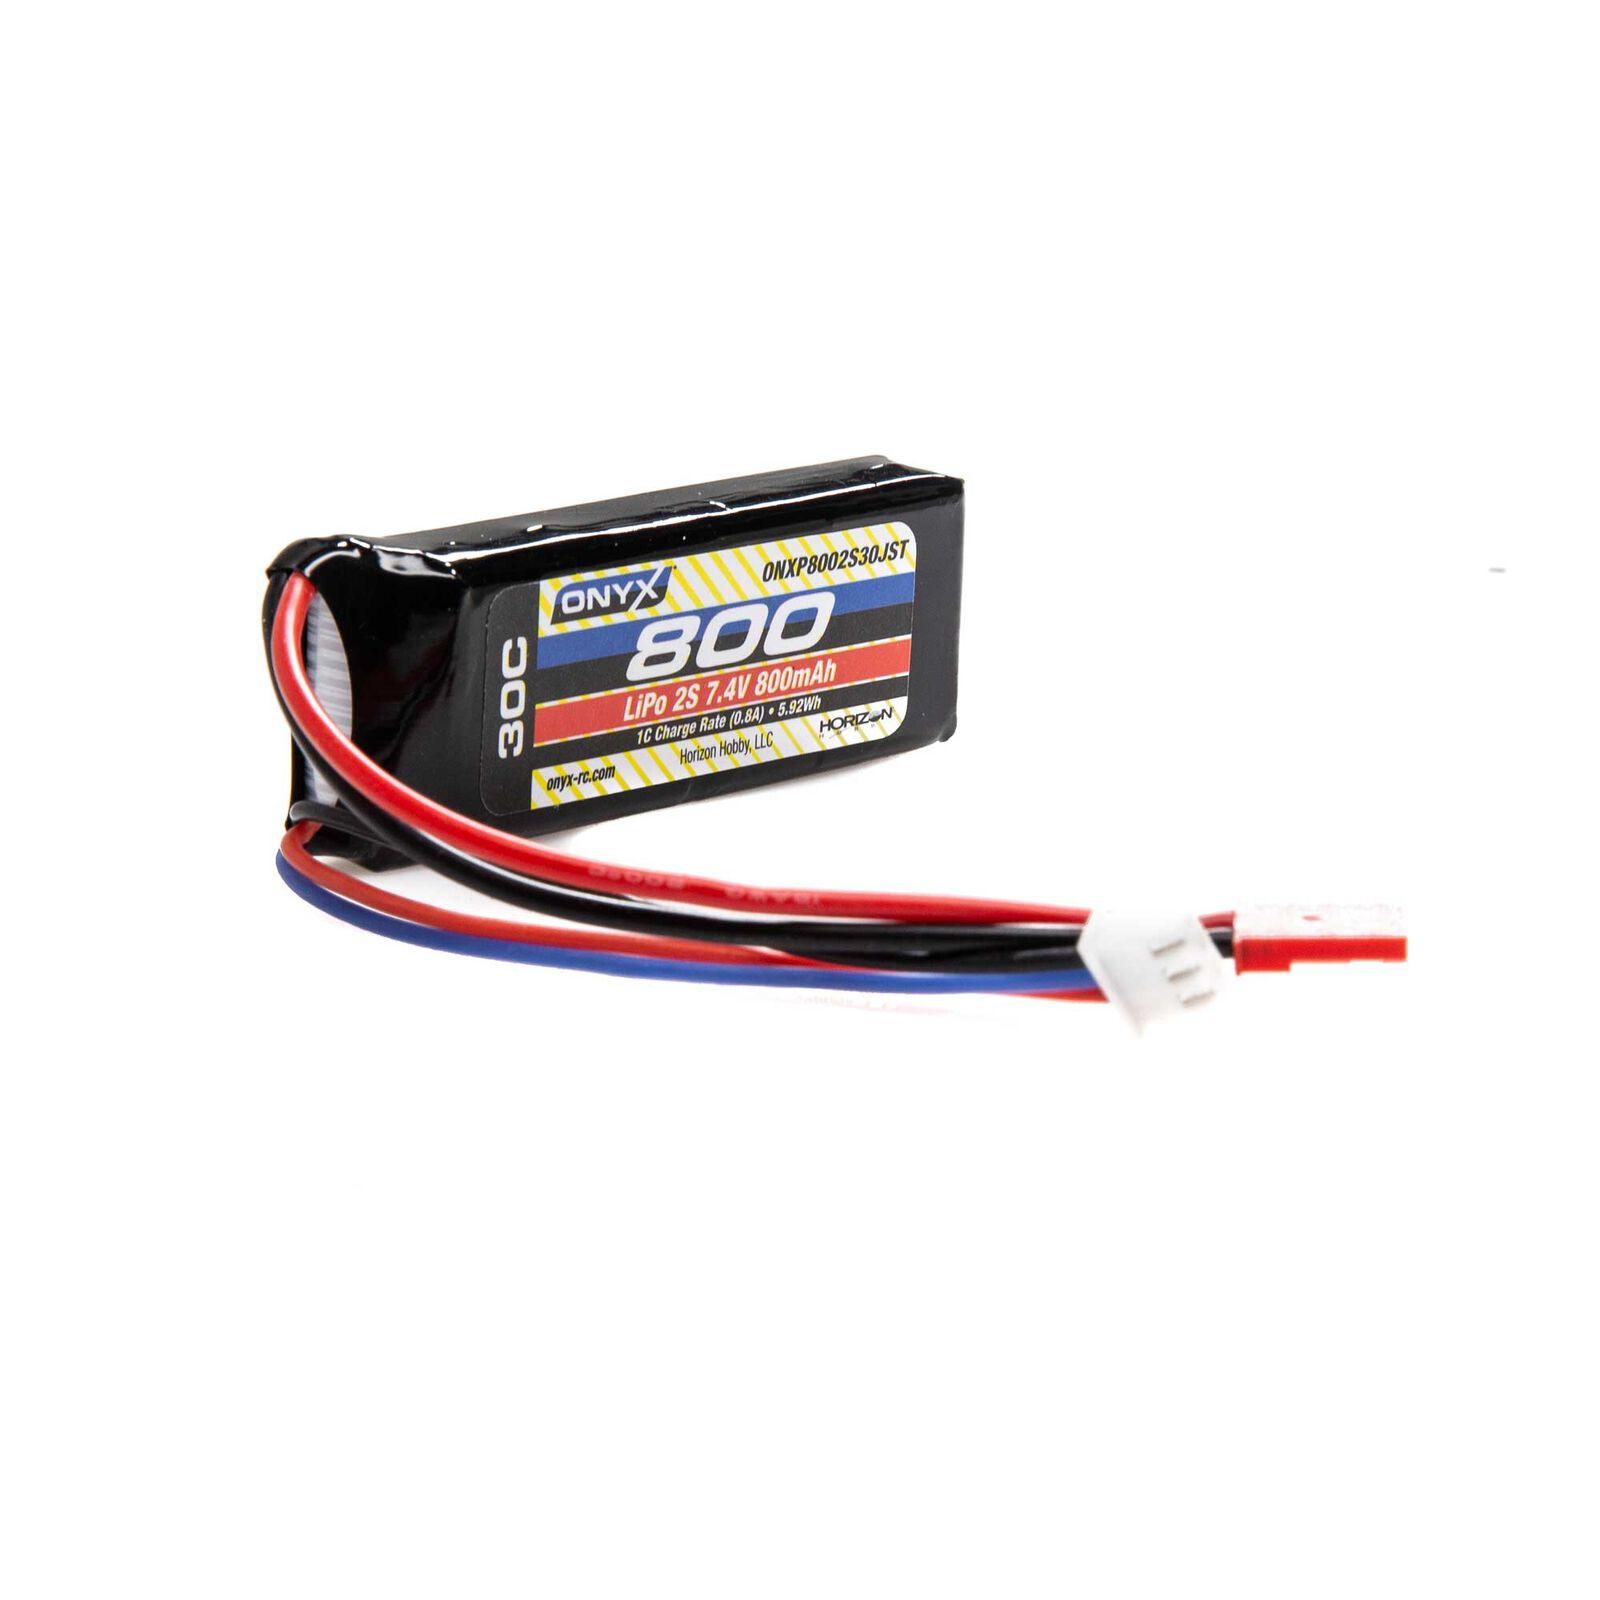 7.4V 800mAh 2S 30C LiPo Battery: JST